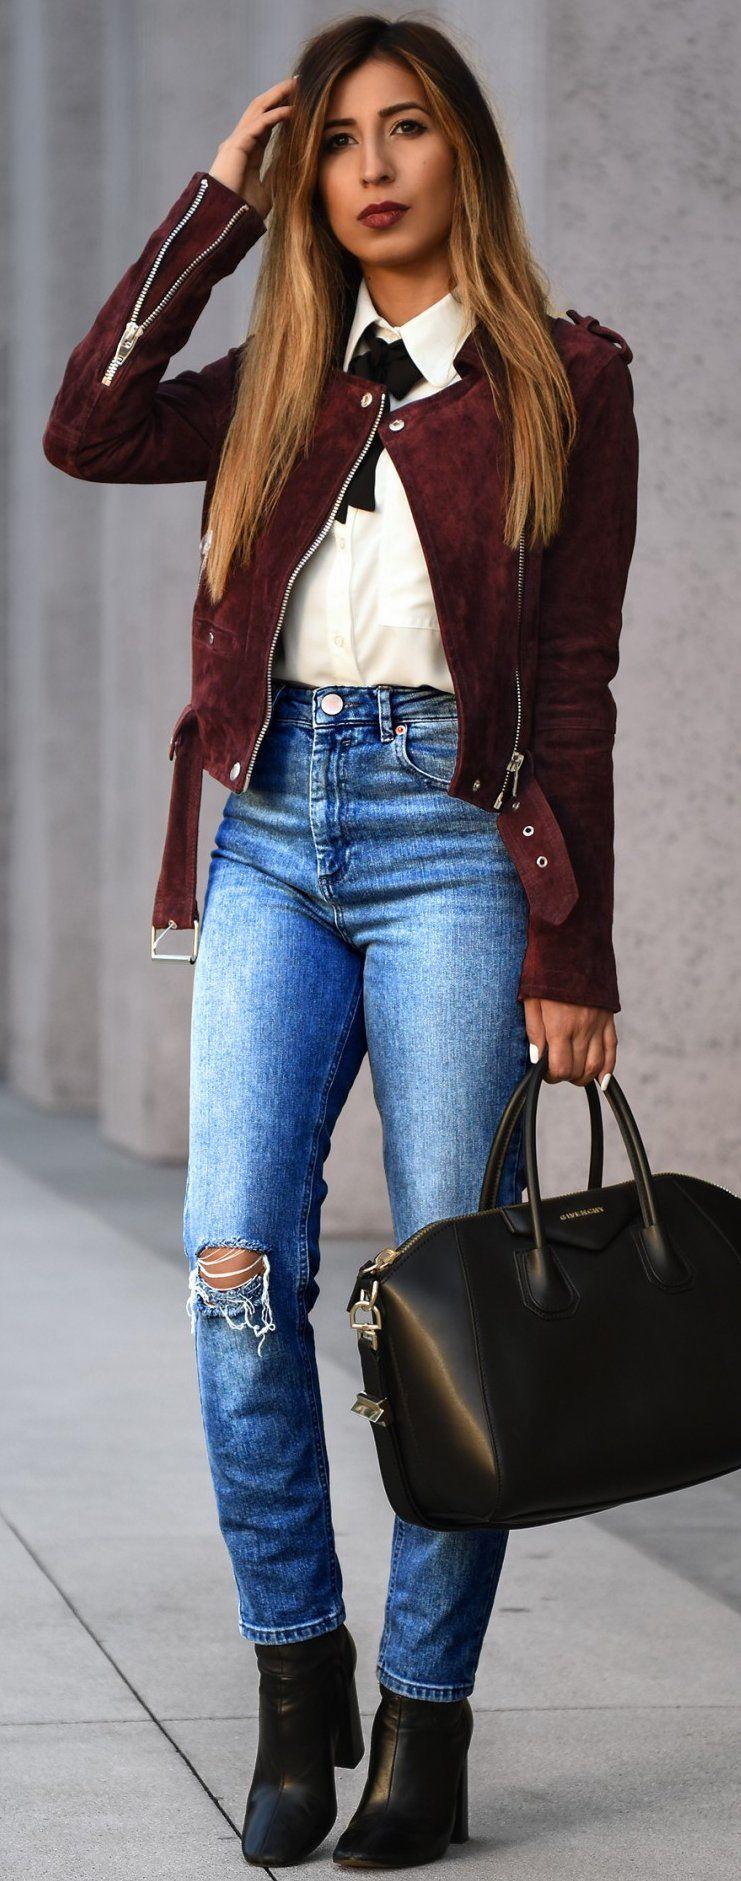 Burgundy Suede + Basics Sourc… Fashion, Autumn fashion